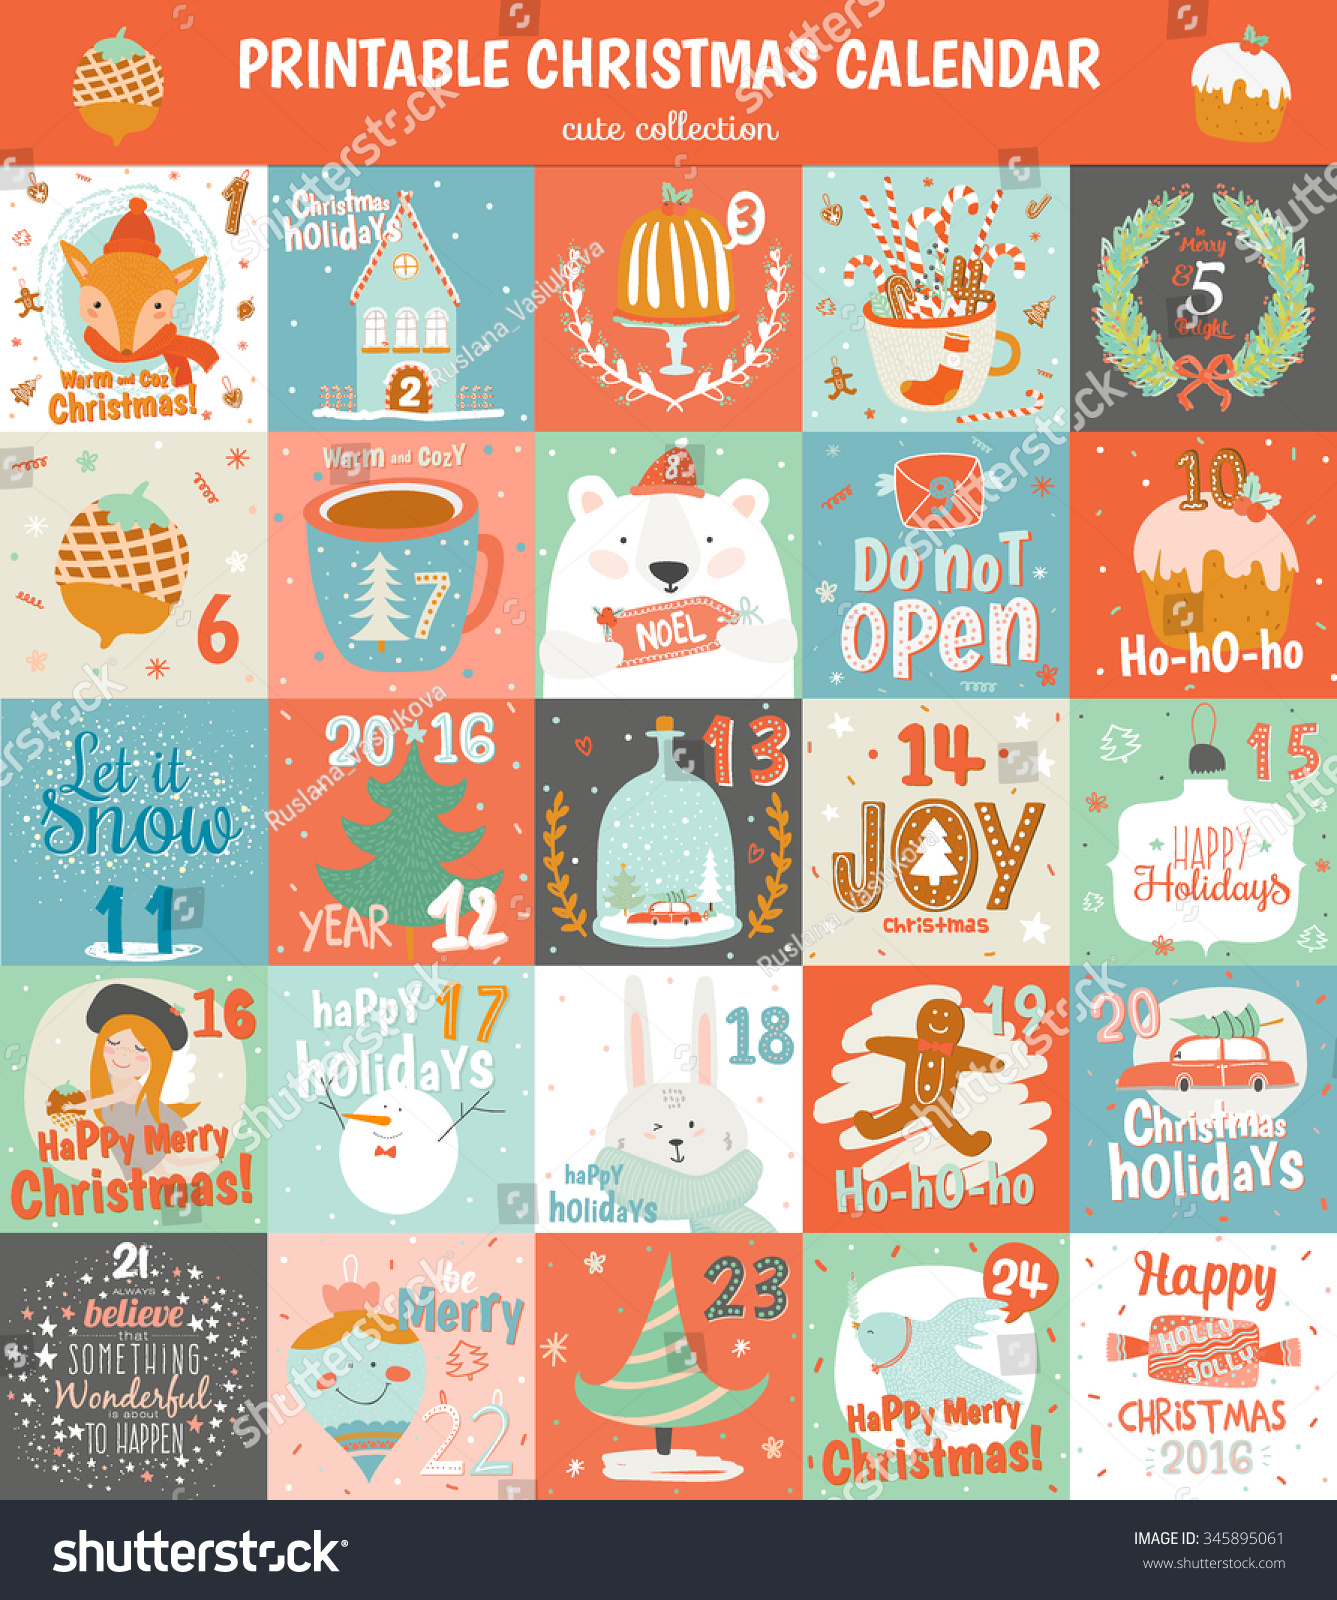 Calendar Symbols Printables : Printable advent calendar vector cute christmas stock